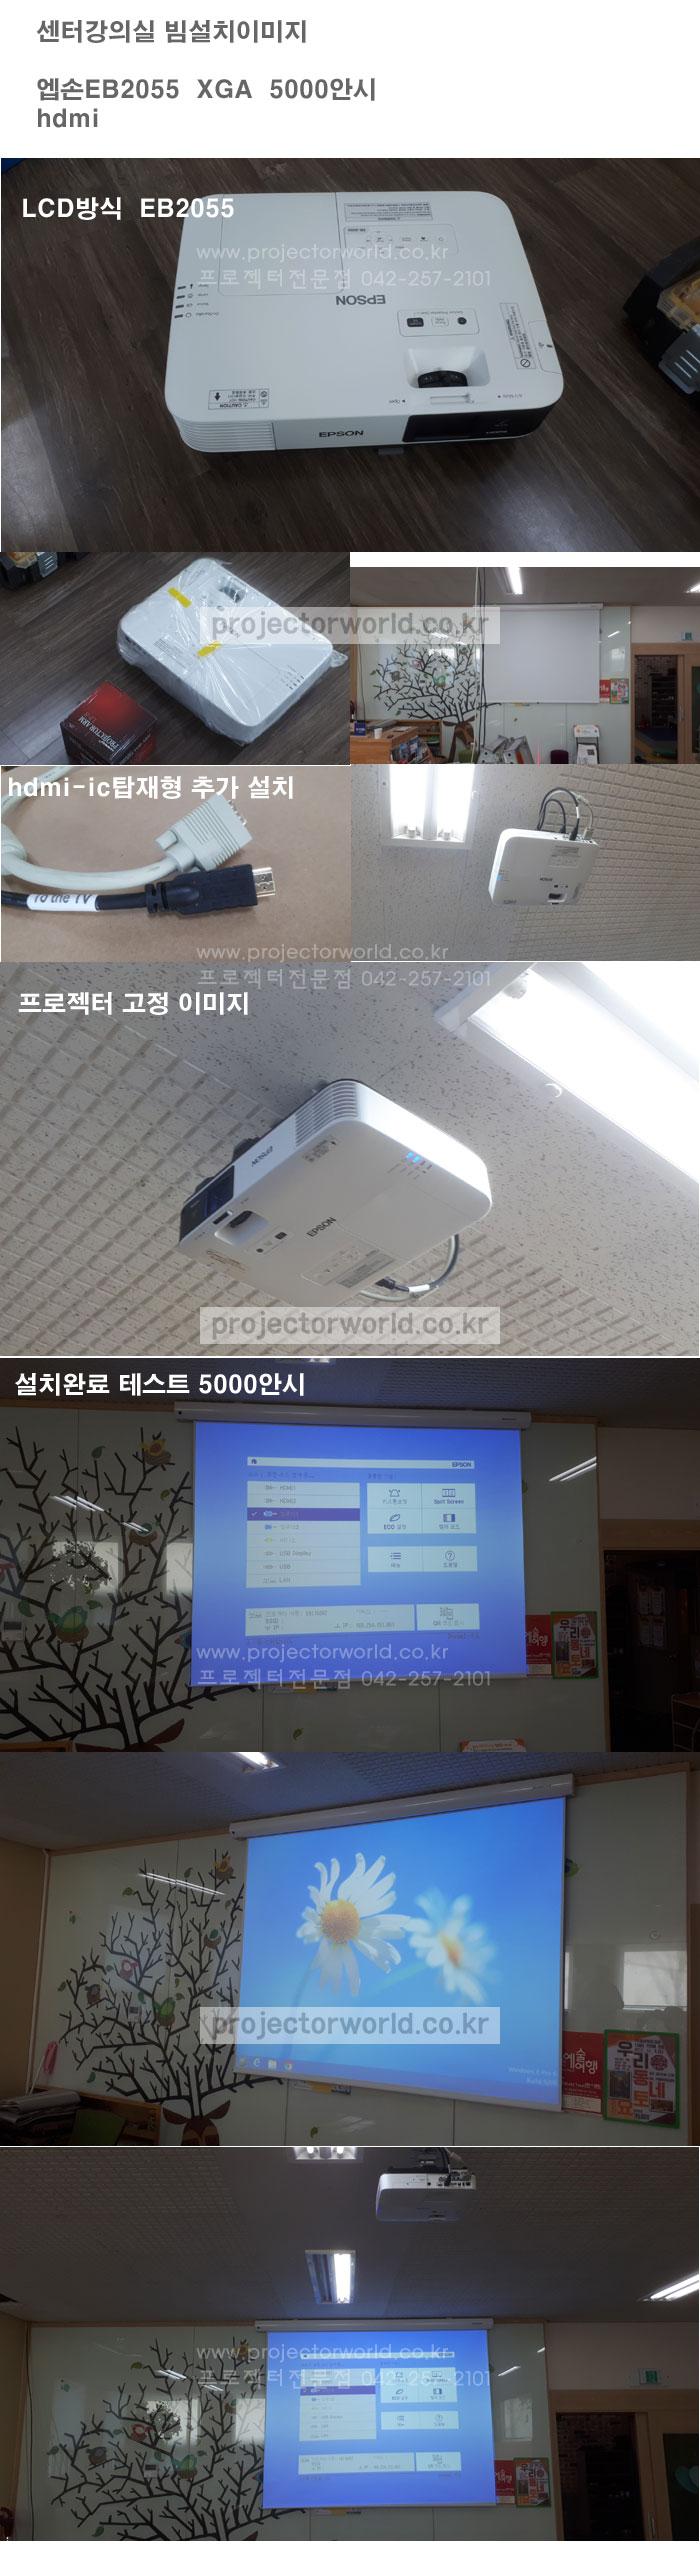 EB2055,대전엡손5000안시,대전프로젝터빔,